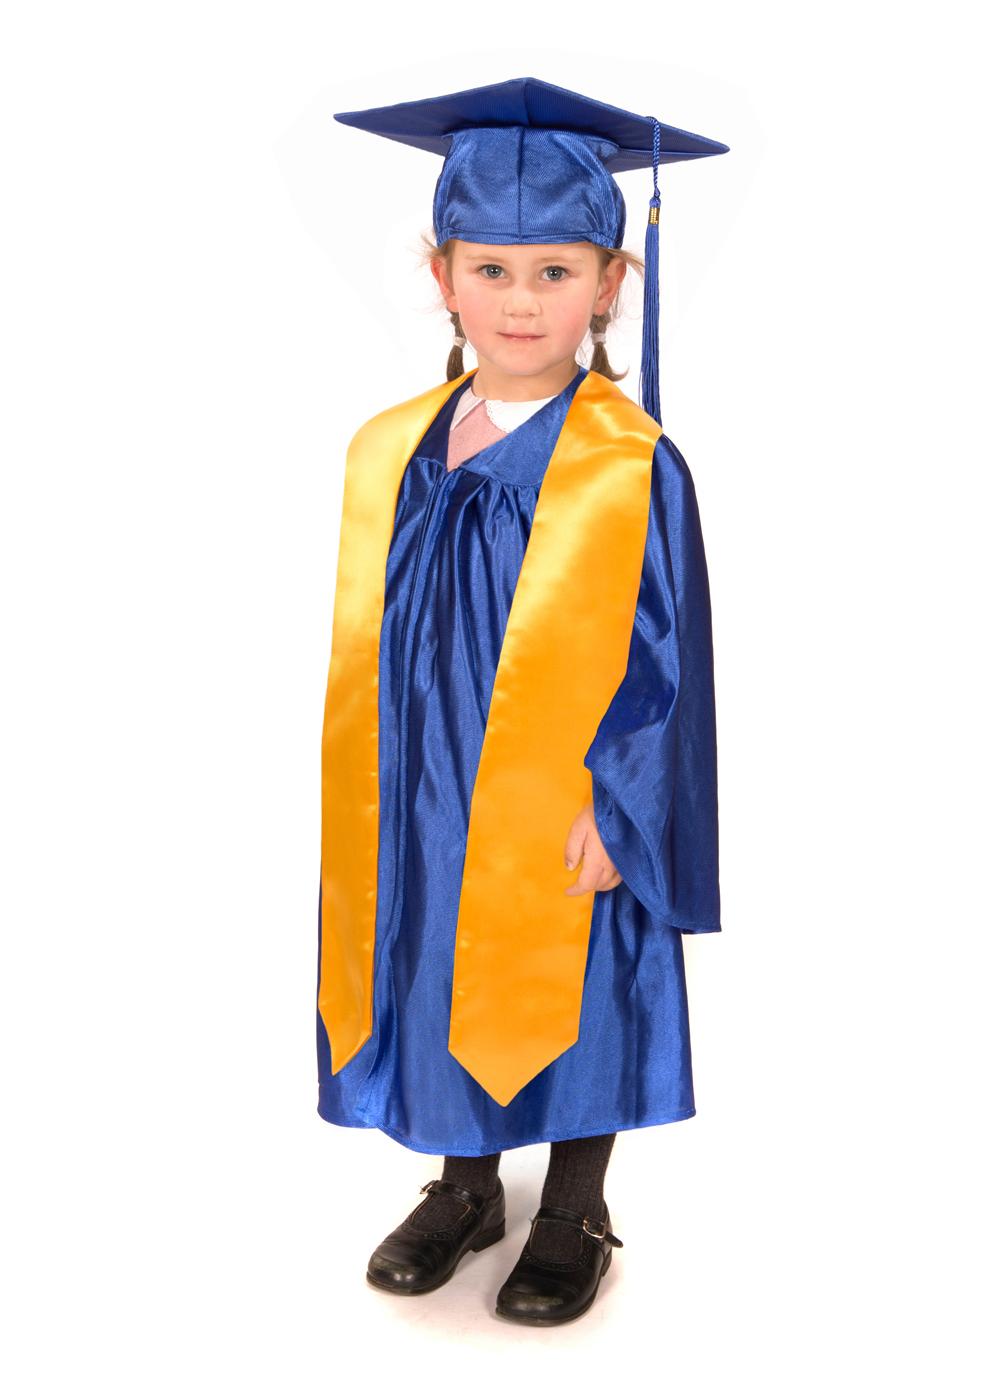 Shiny Nursery Graduation Gown, Cap & Stole - Graduation Gowns in ...